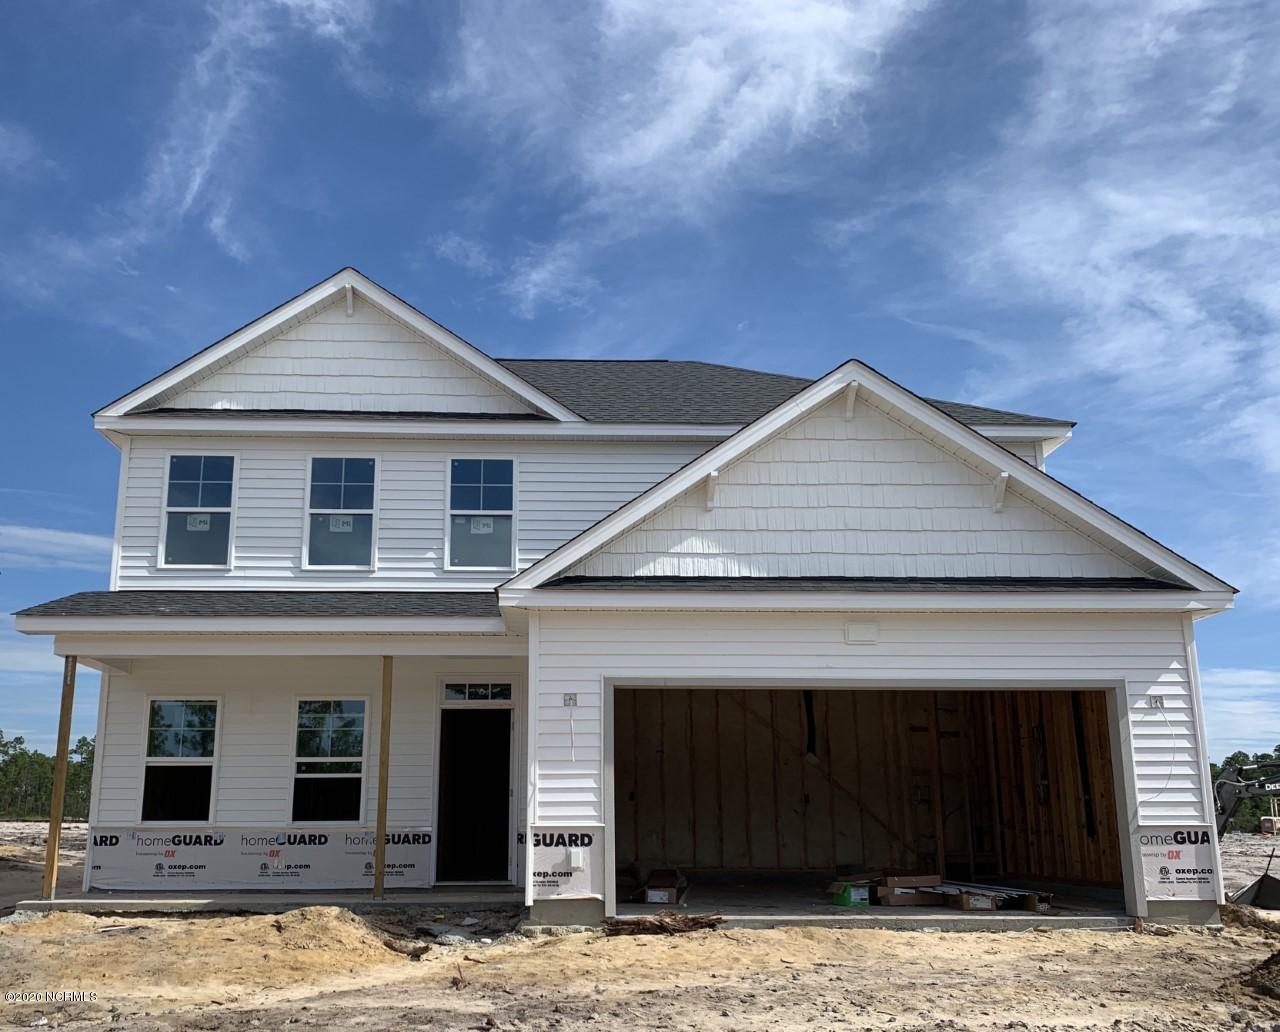 2605 Longleaf Pine Circle, Leland, North Carolina 28451, 3 Bedrooms Bedrooms, ,2 BathroomsBathrooms,Residential,For Sale,Longleaf Pine,100224300